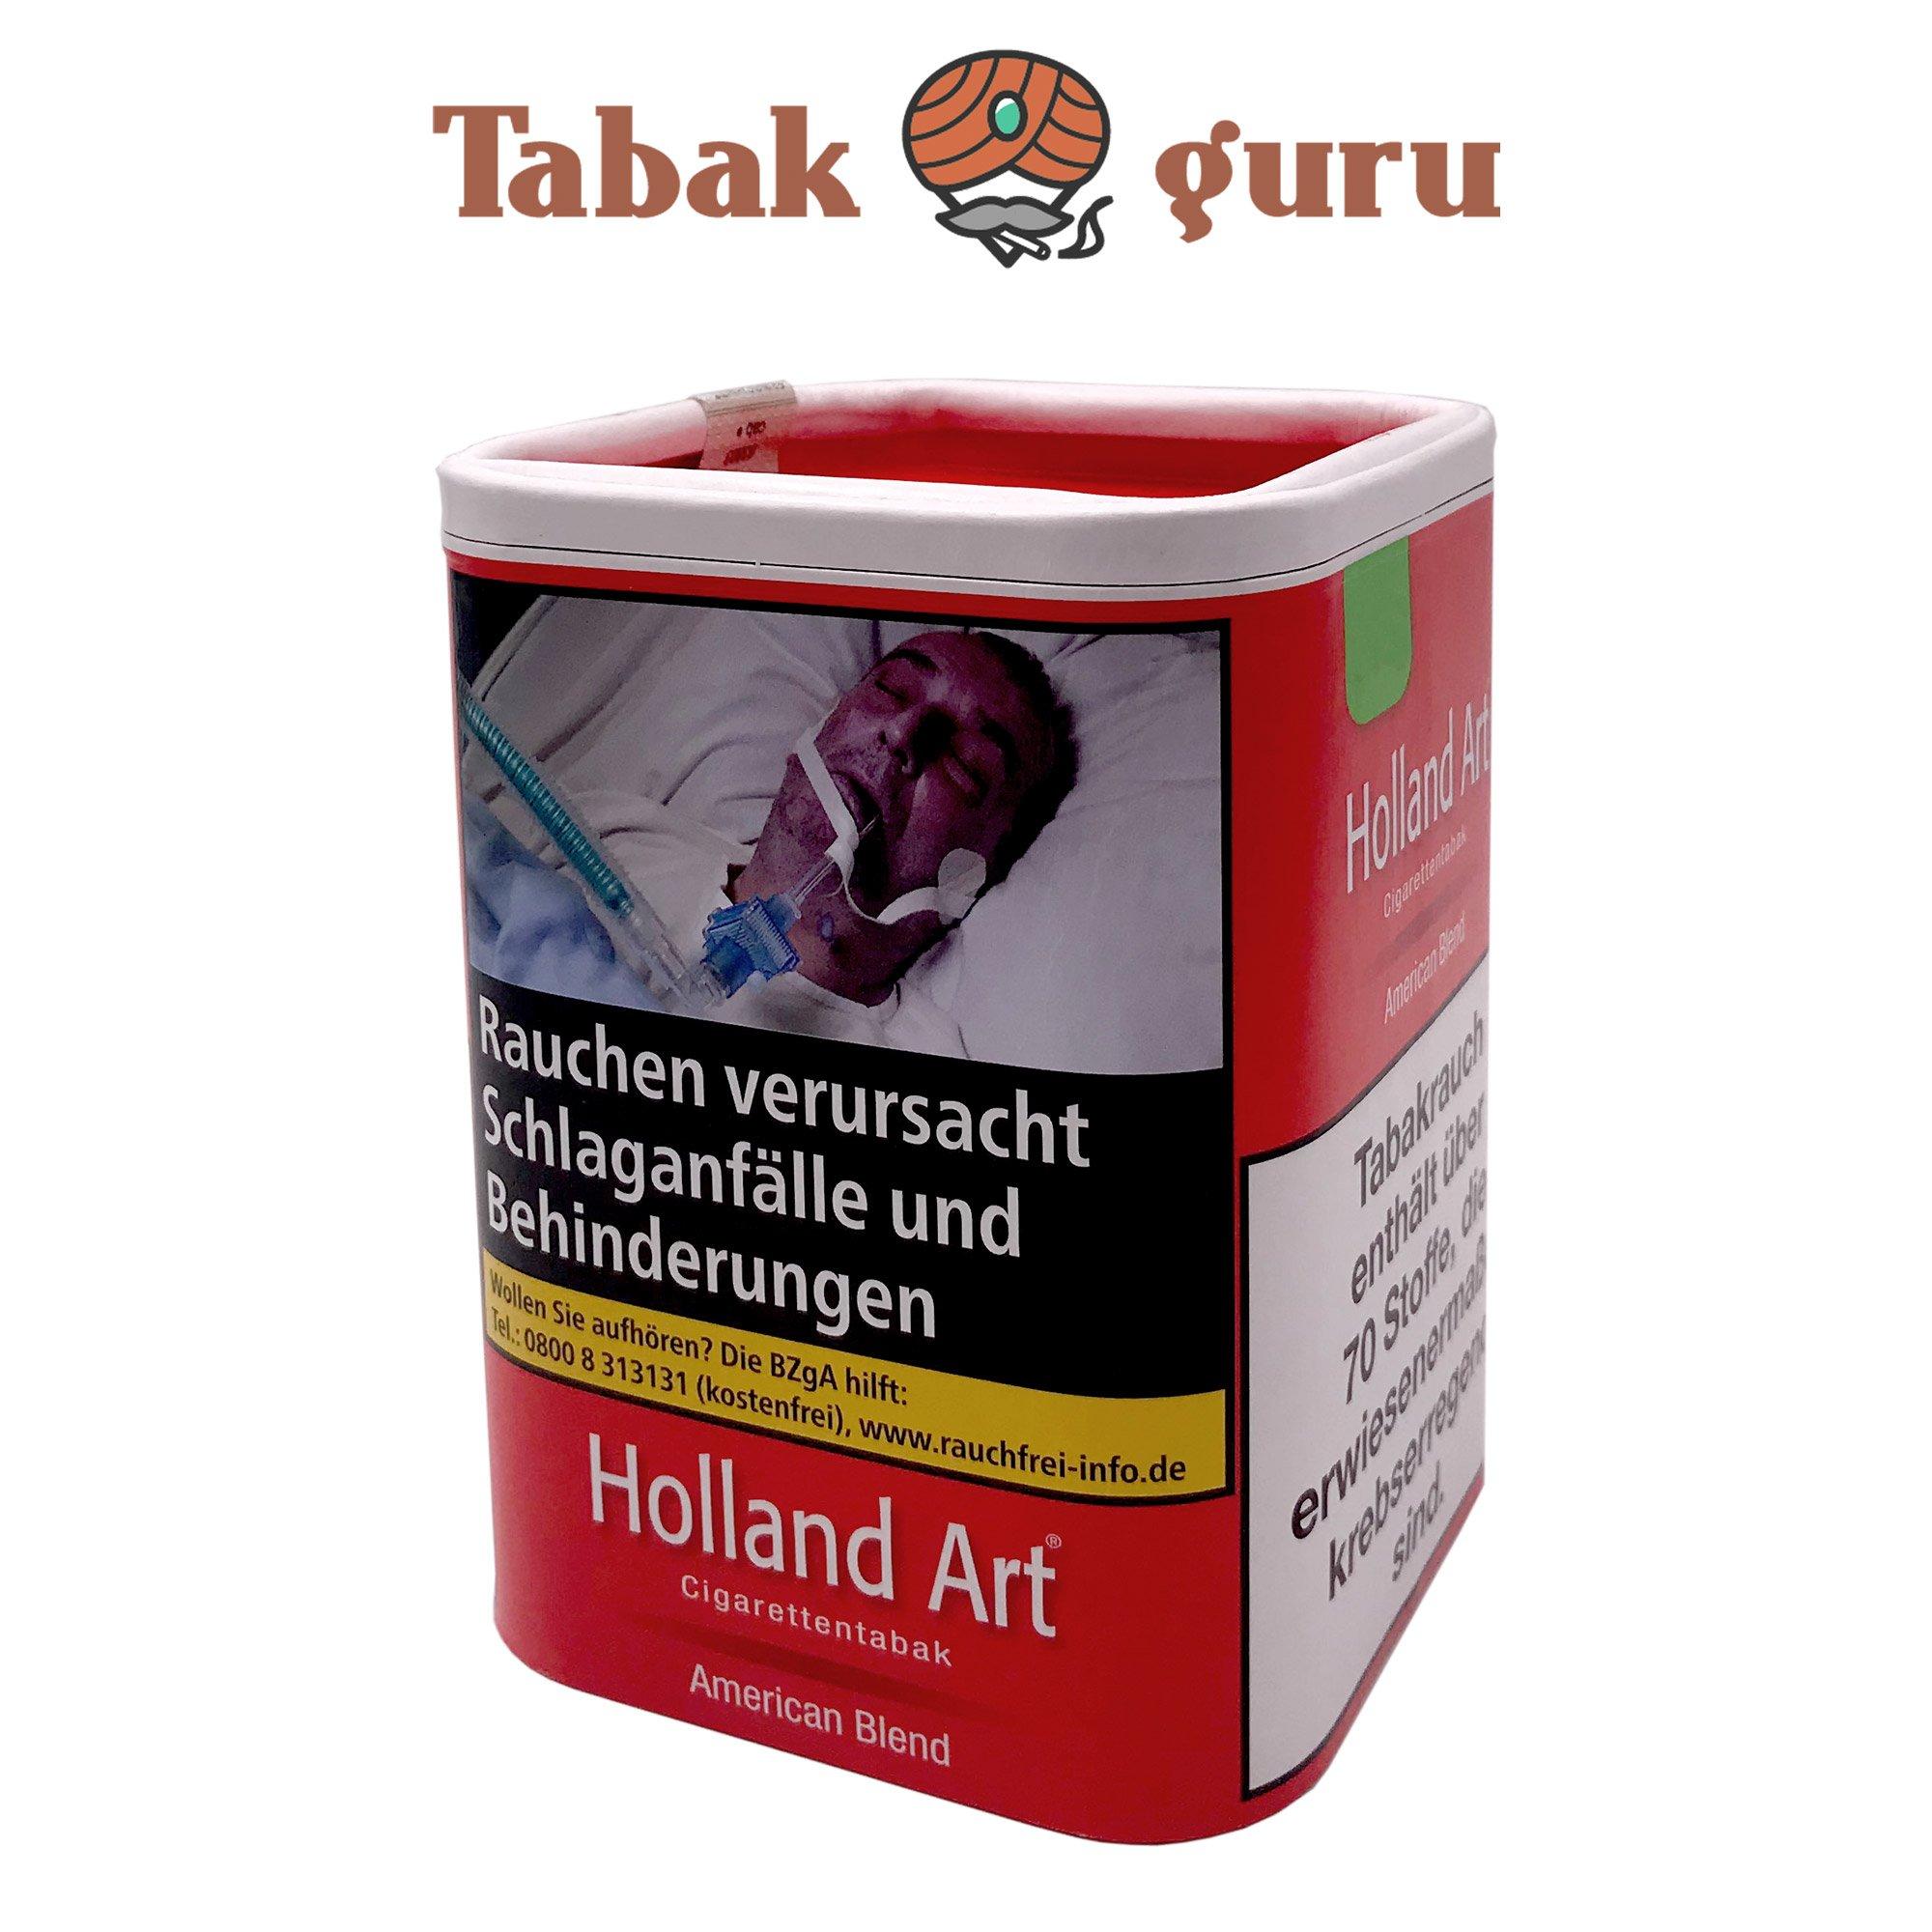 Holland Art Zigarettentabak / Feinschnitttabak Dose